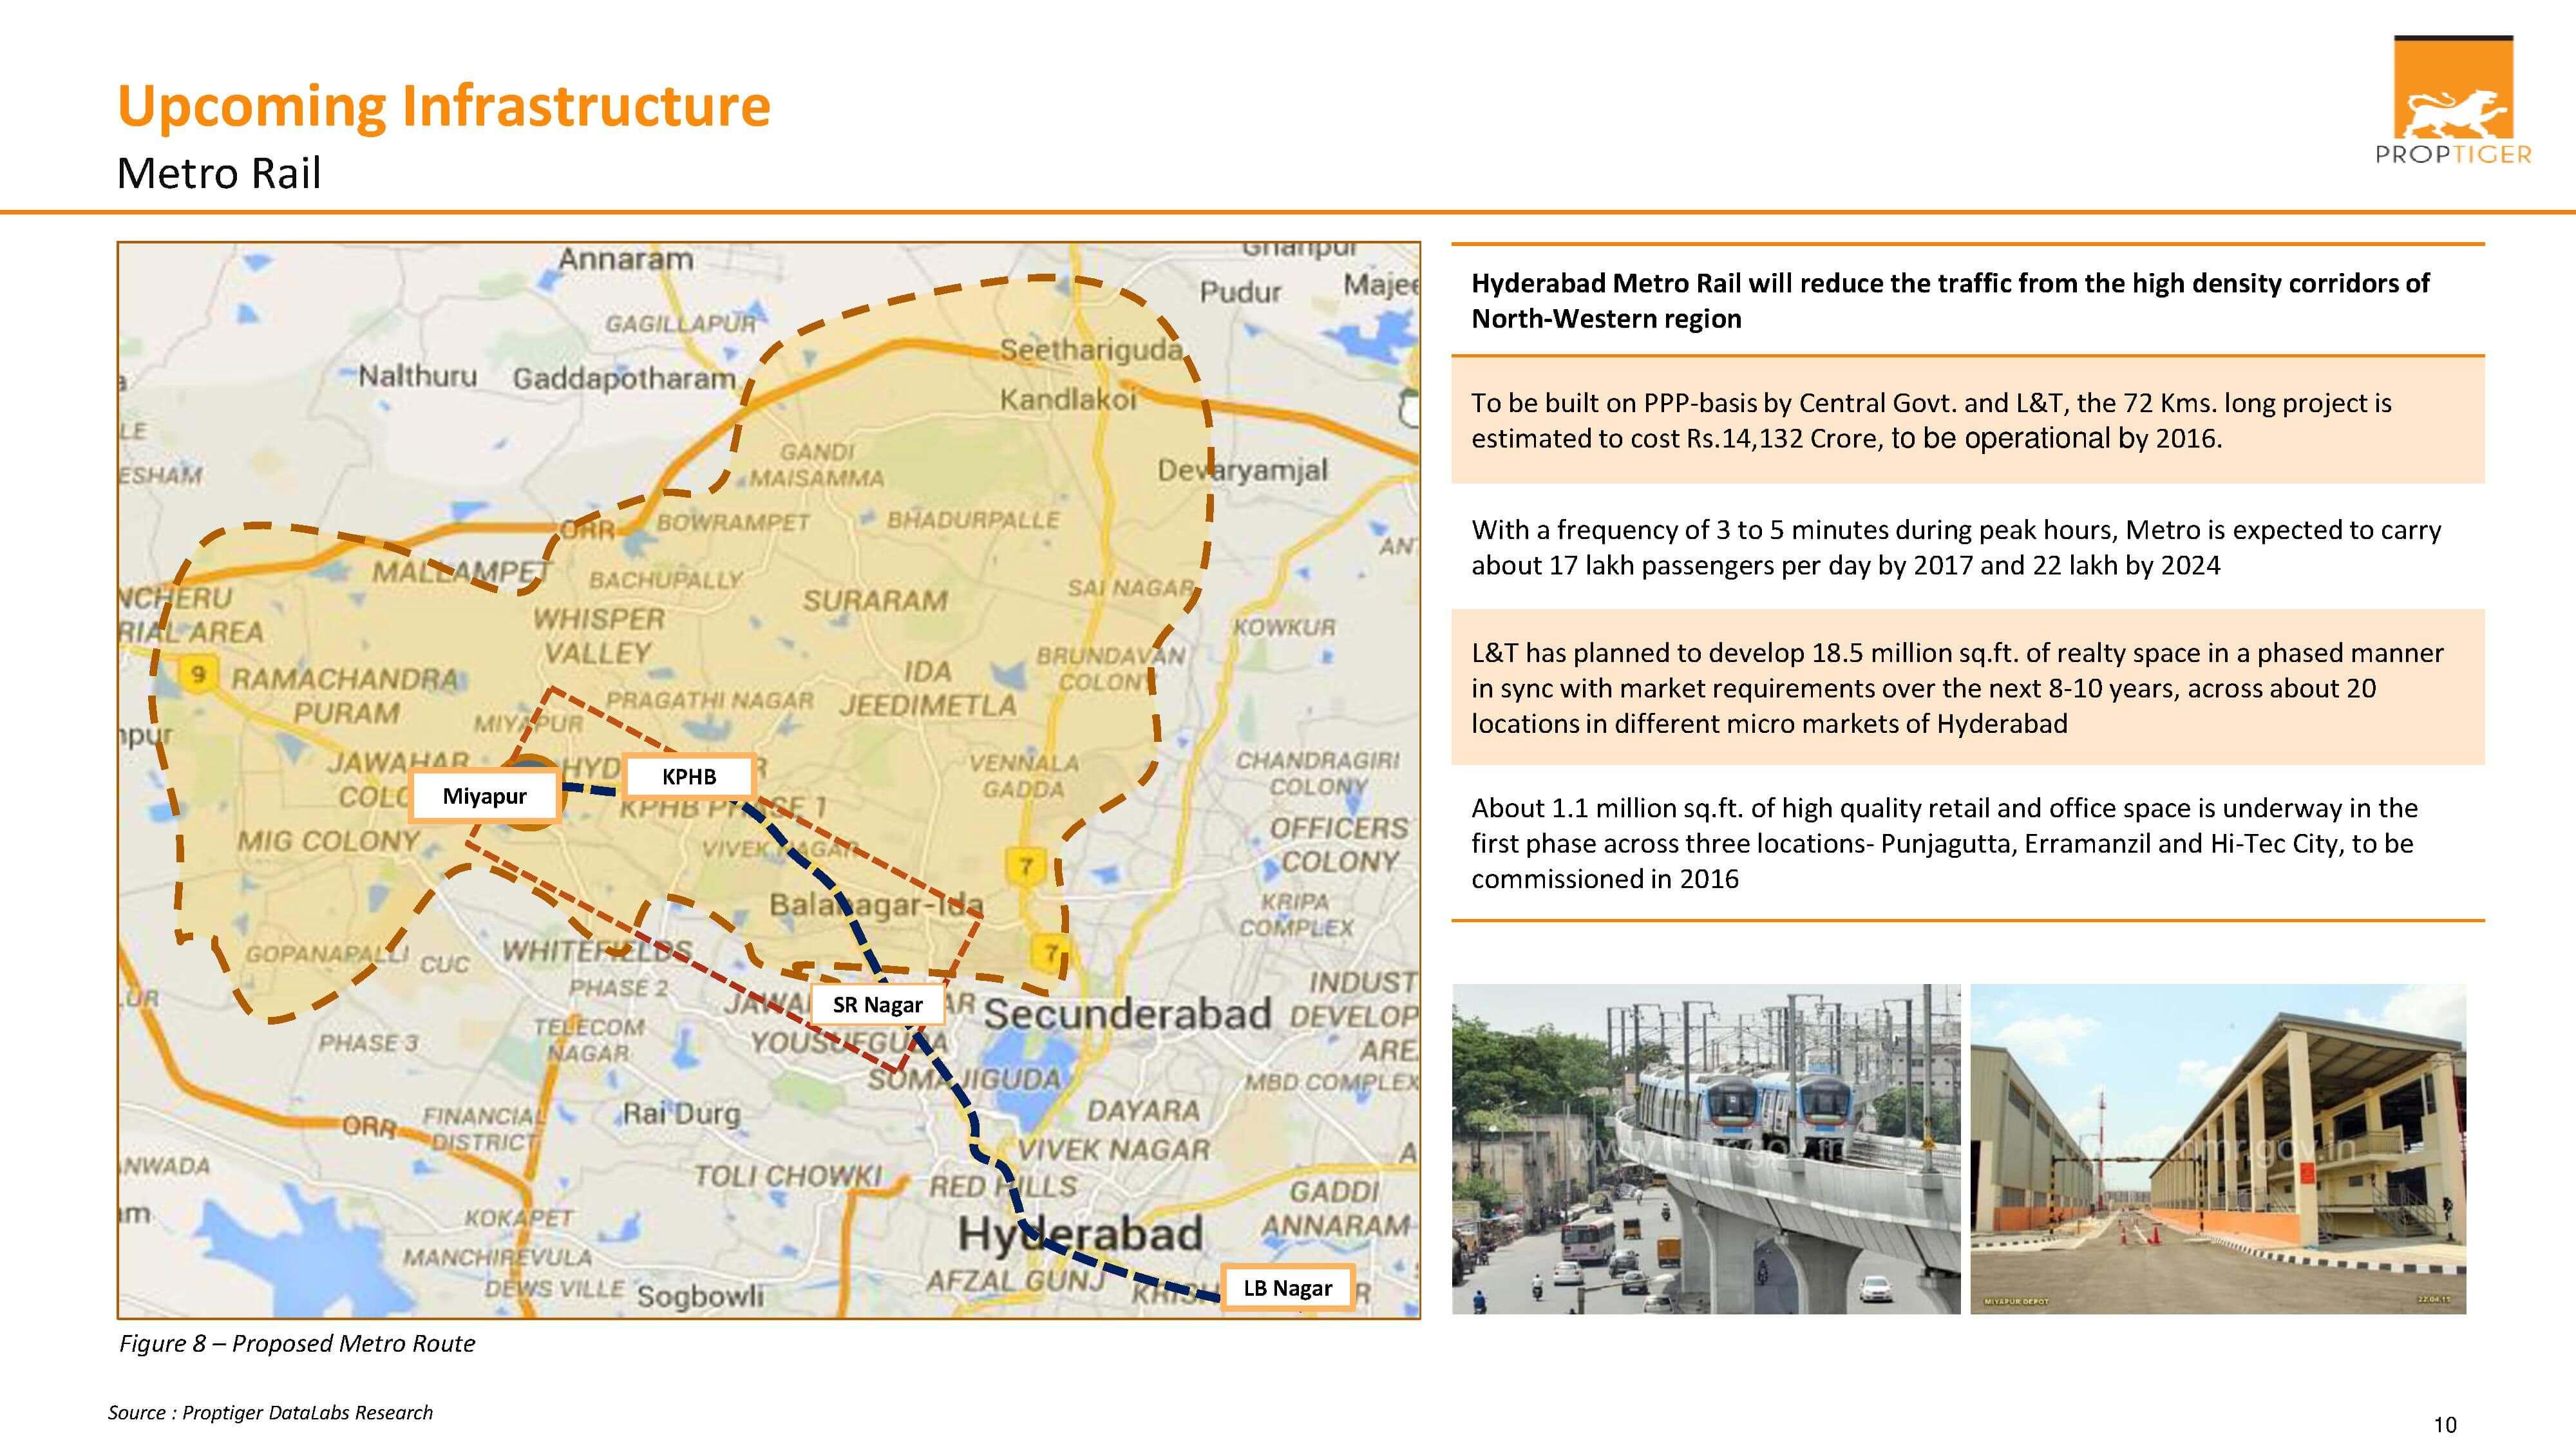 Upcoming Infrastructure - Metro Rail